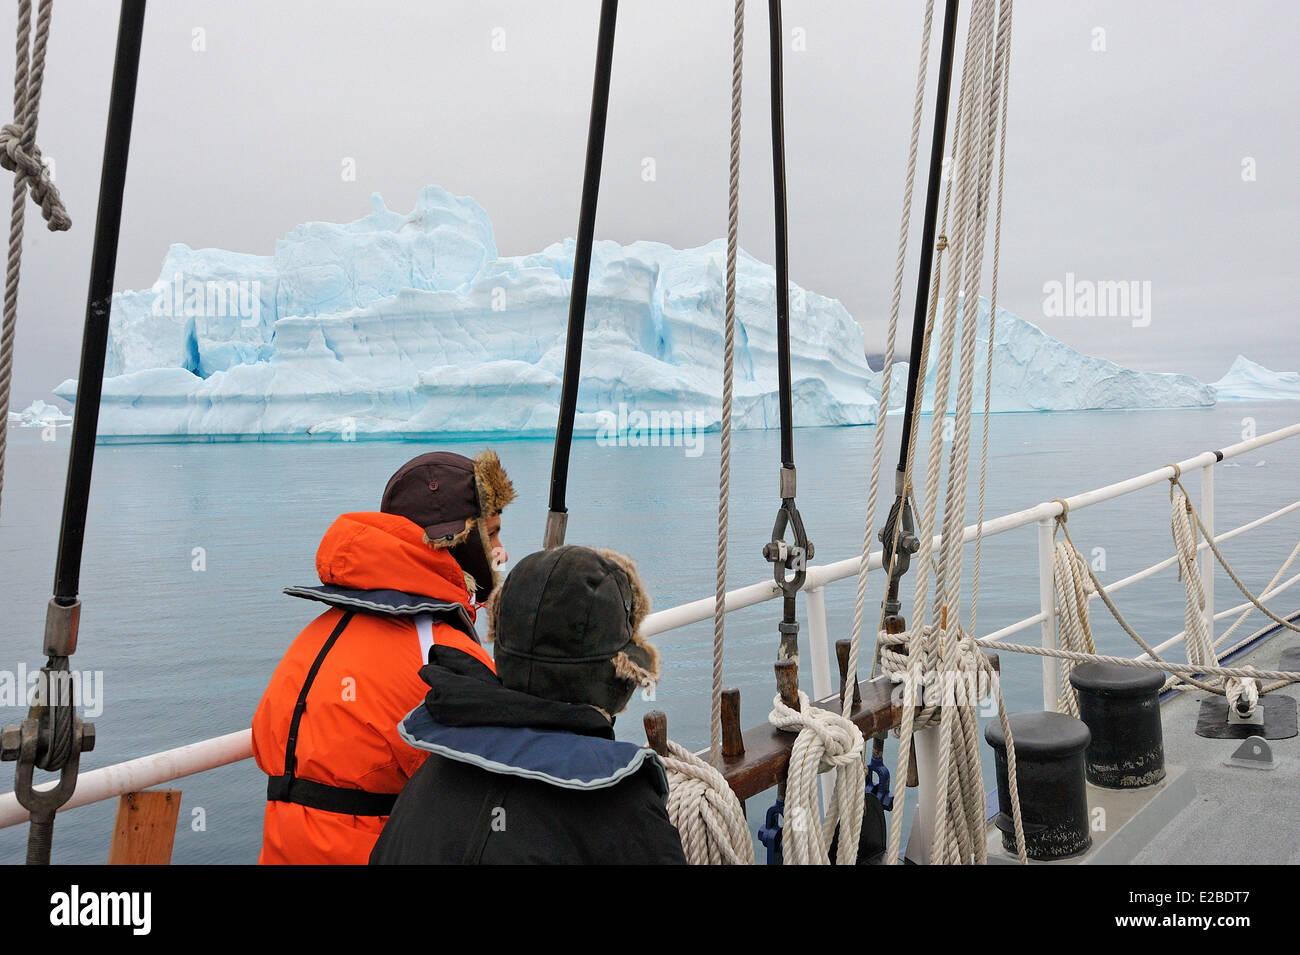 Greenland, Melville Bay, Cape York, Aboard schooner Rembrandt Van Rijn, Tricky navigation amidst drifting icebergs - Stock Image